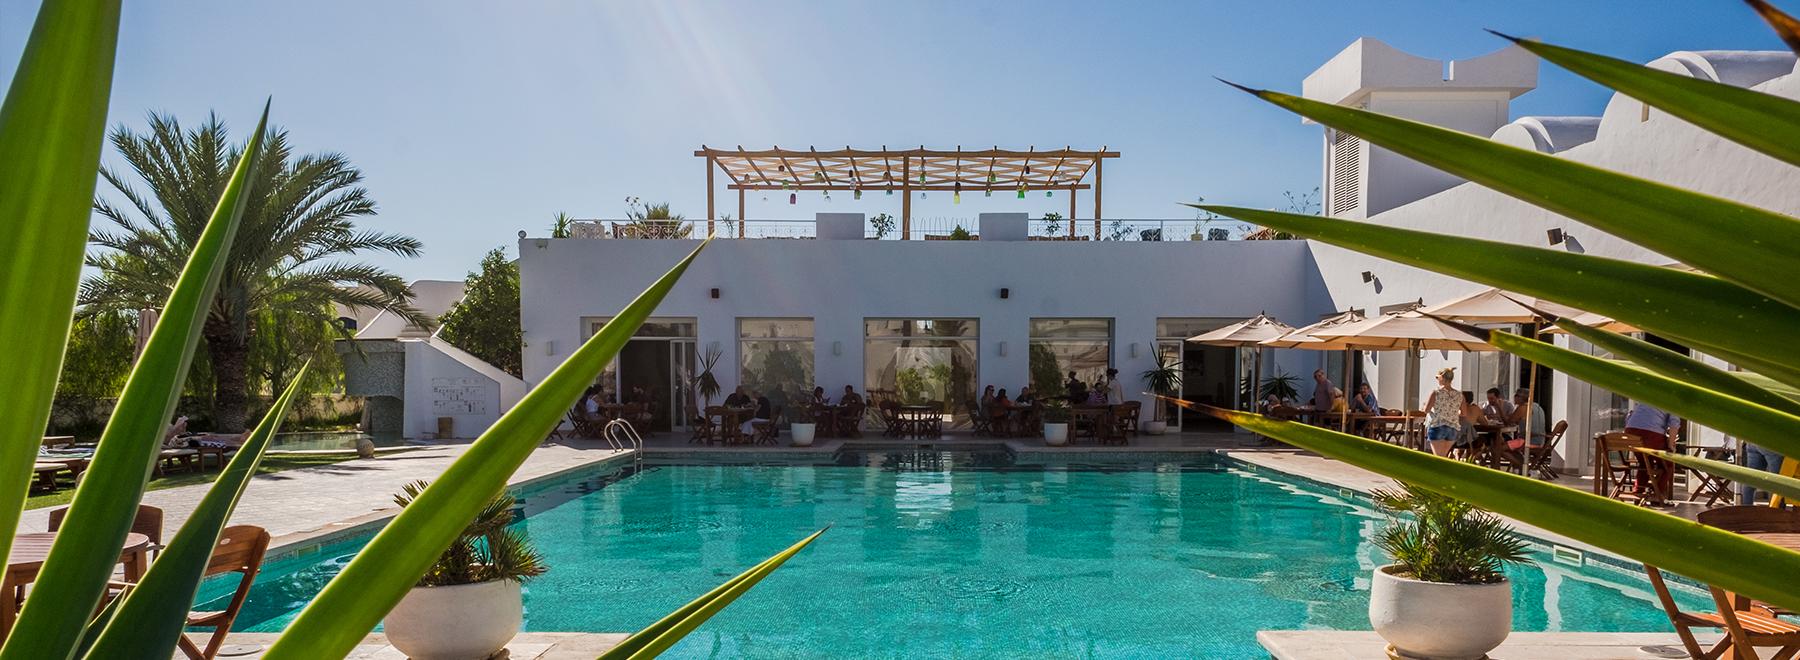 Kitesurfing Djerba Pool